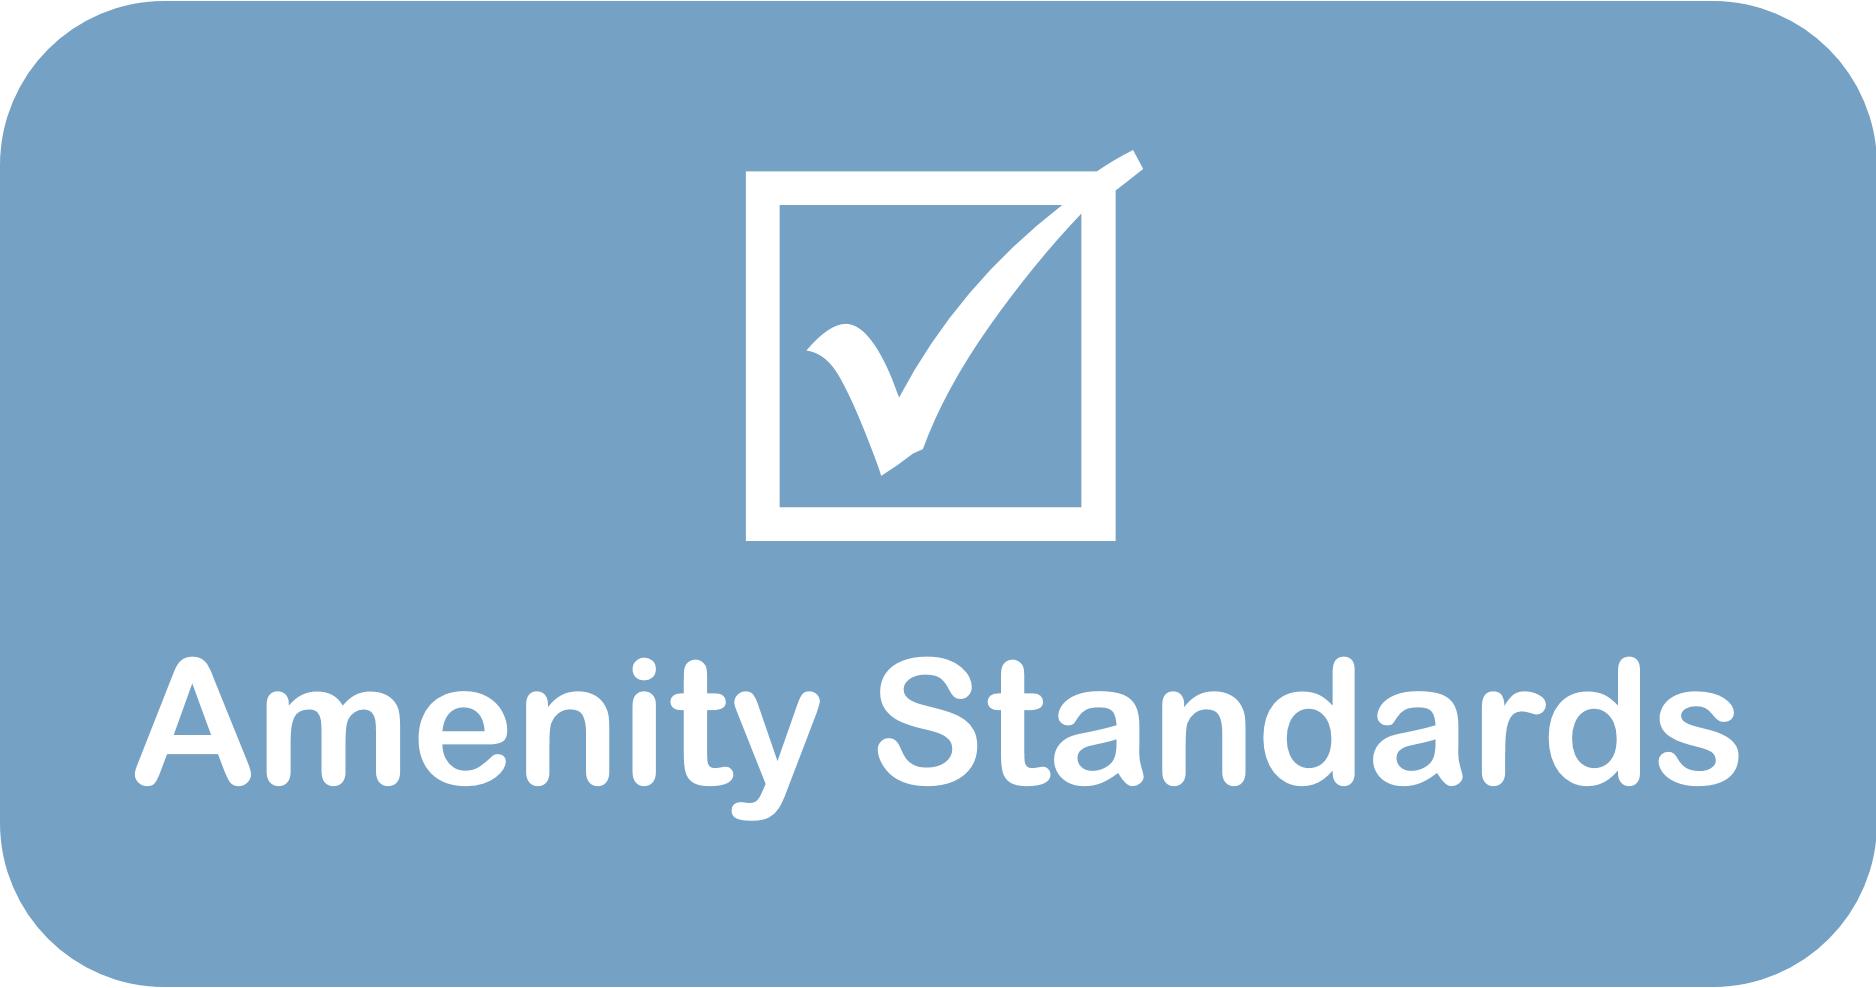 Amenities & Space Standards